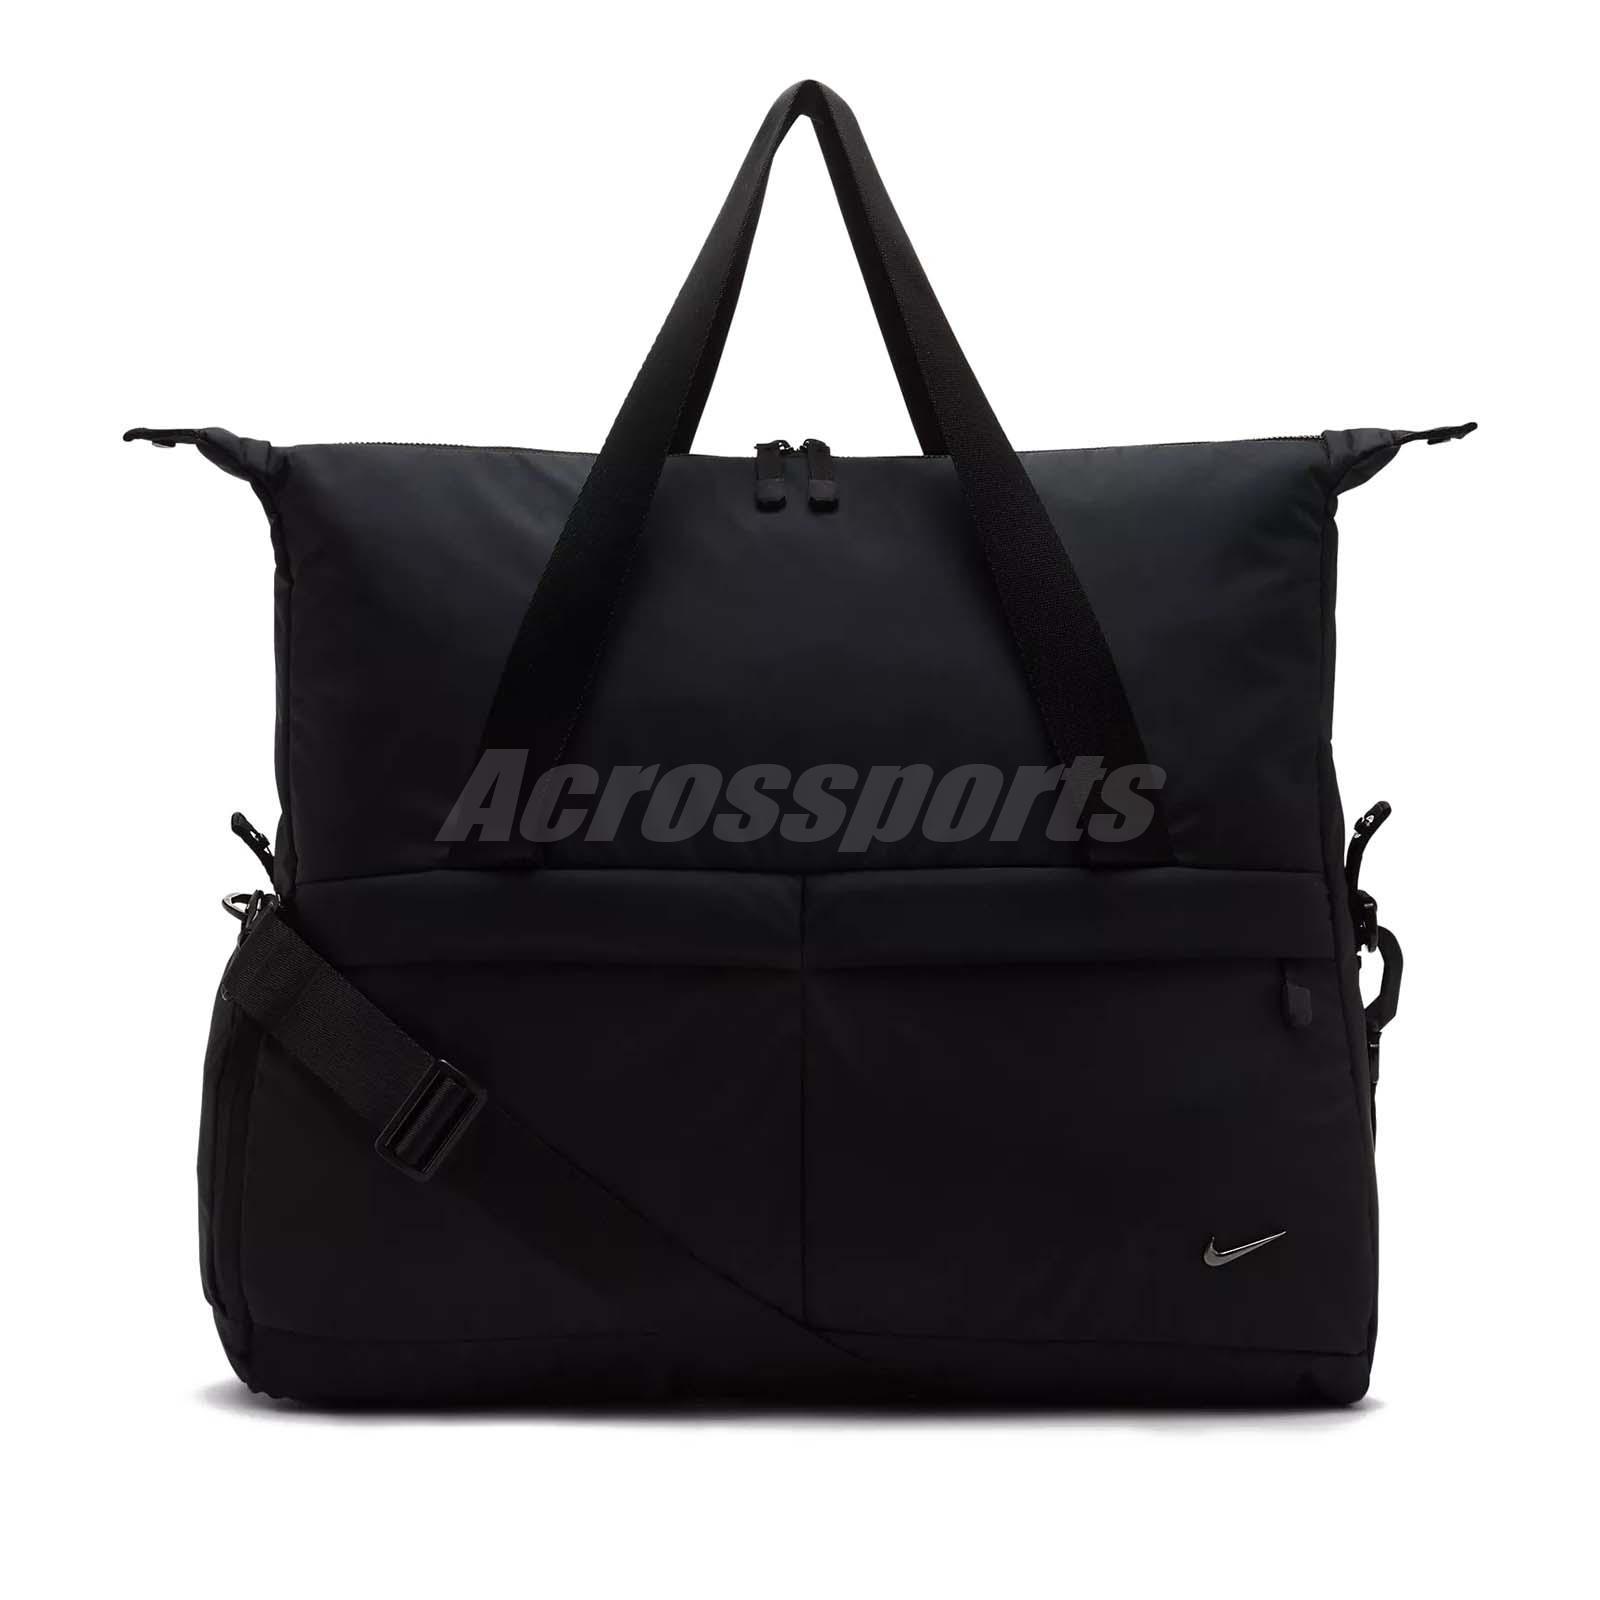 becfc6a90868 Details about Nike Women Club Training Bag Tote Shoulder Bag Yoga Gym  Sports Black BA5441-010